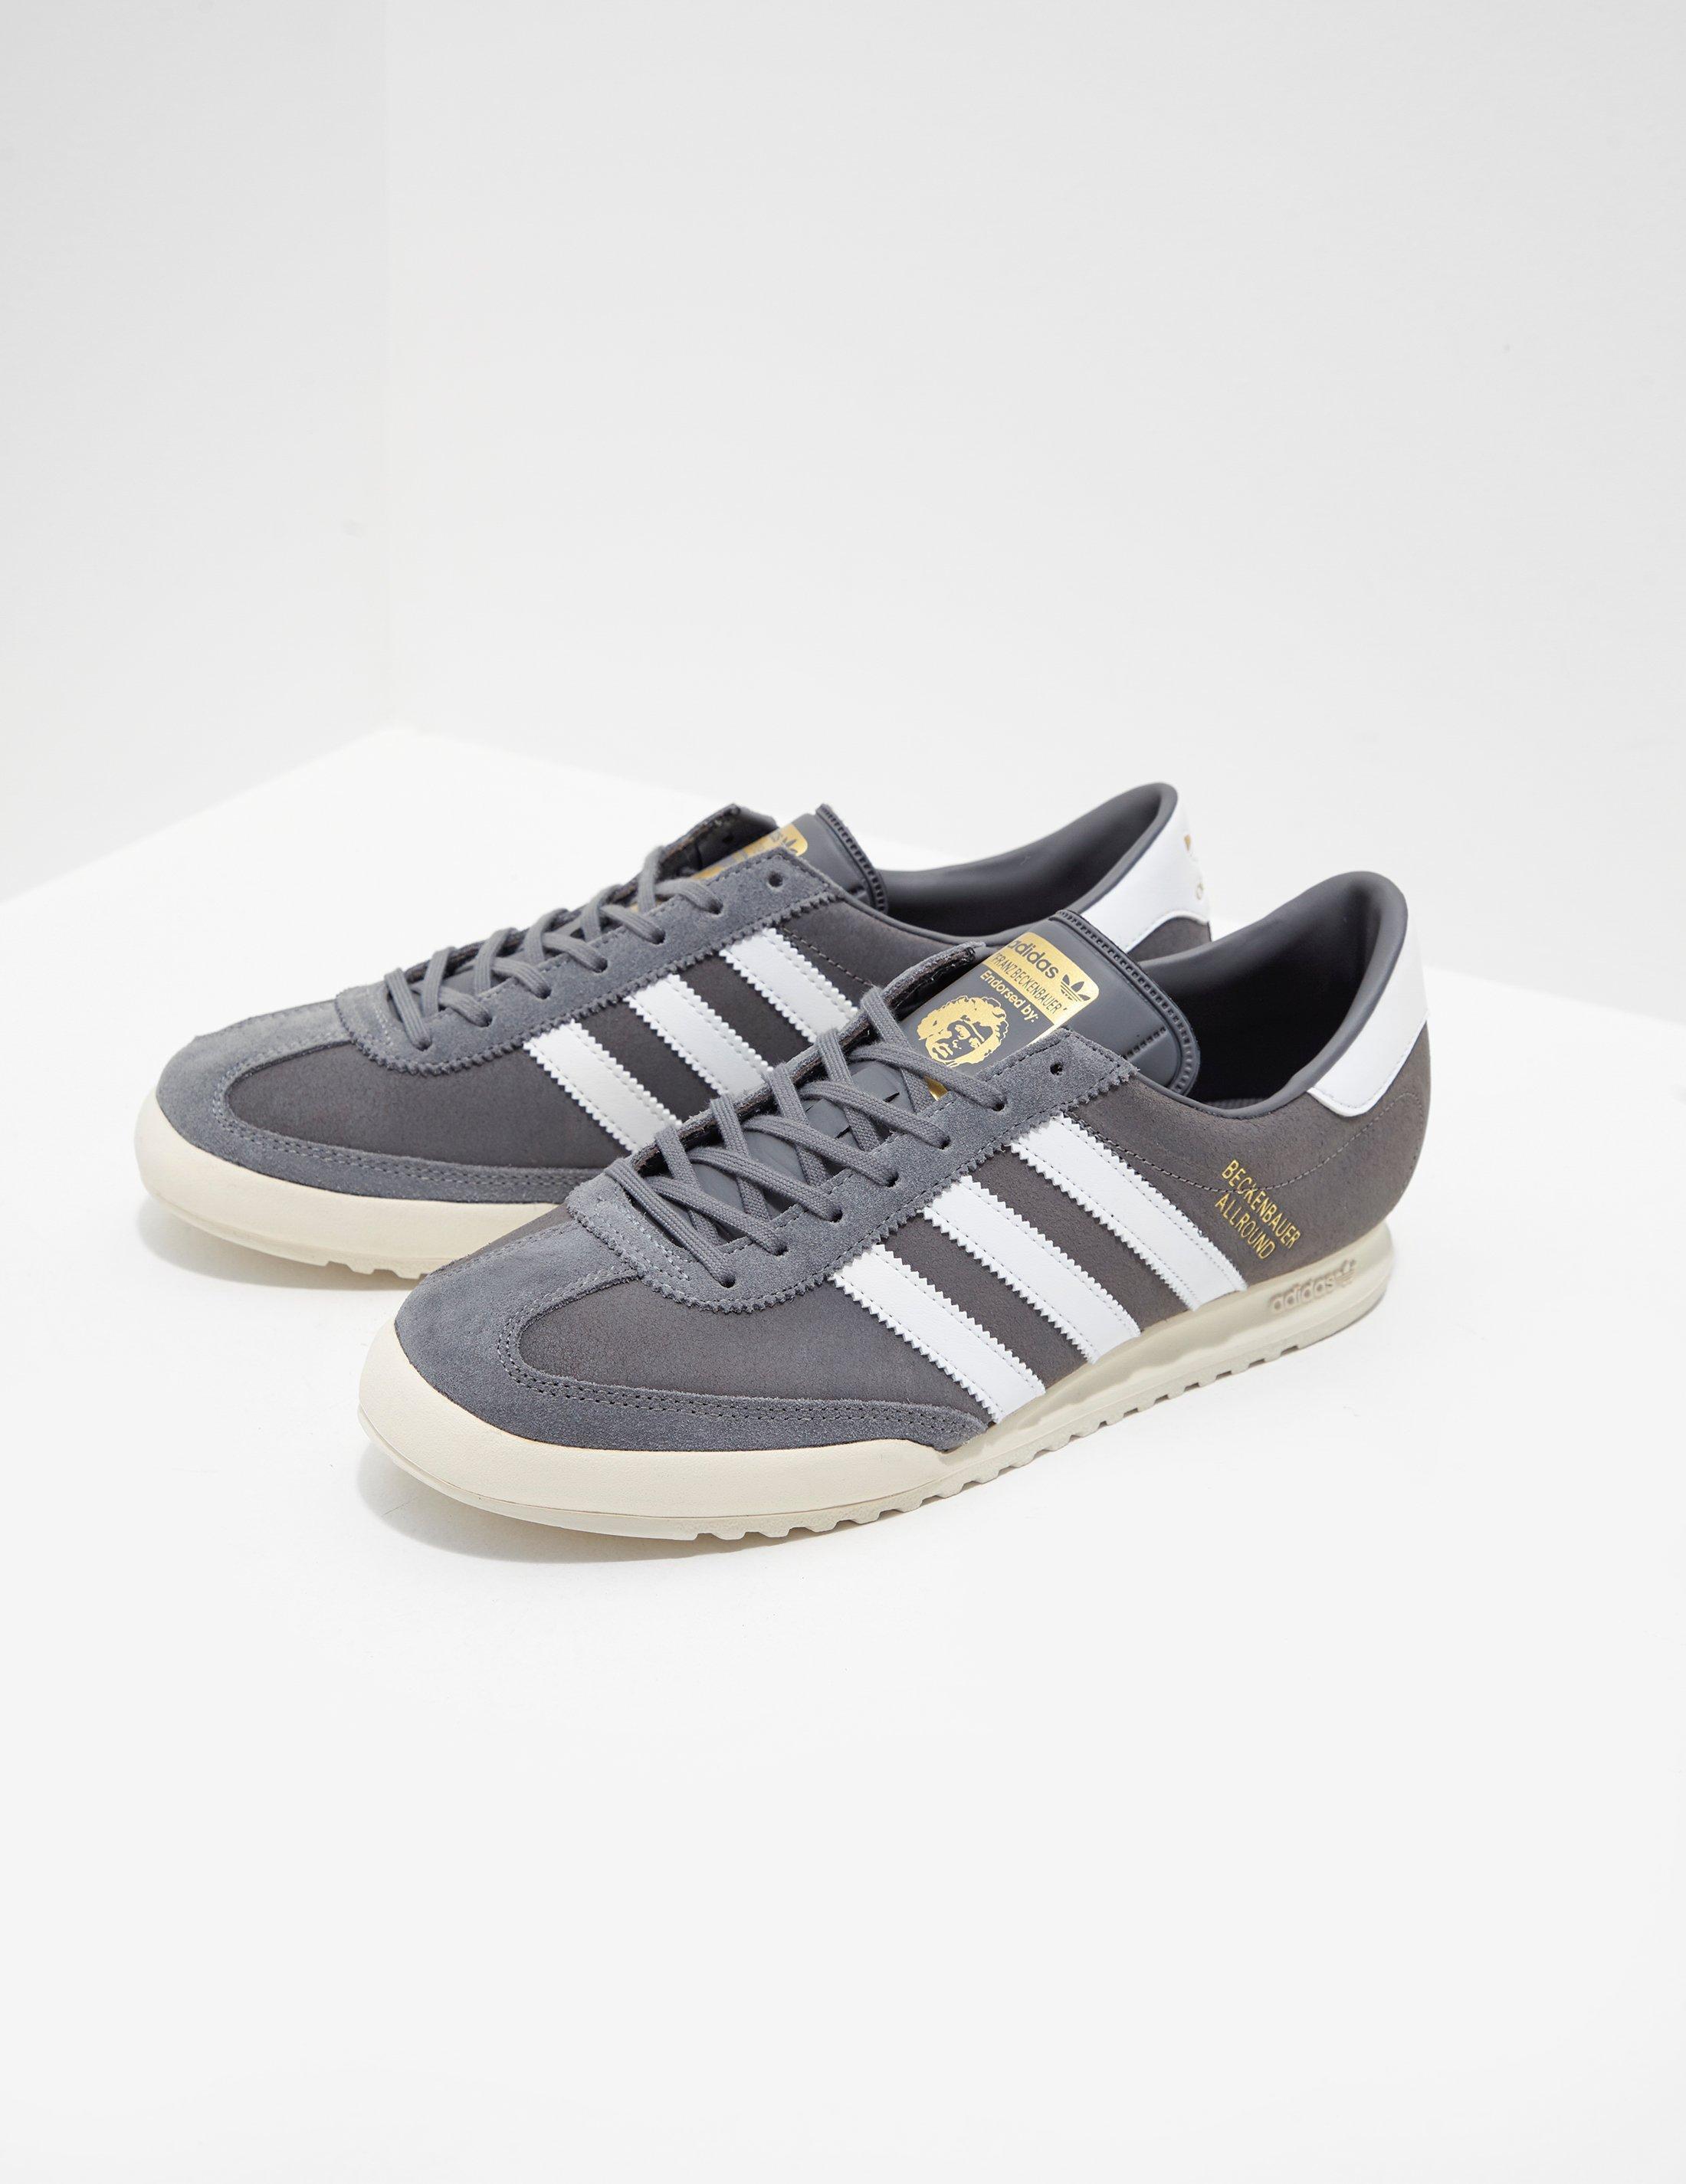 29c939bfea Lyst - adidas Originals Beckenbauer - Exclusively To Tessuti Grey in ...